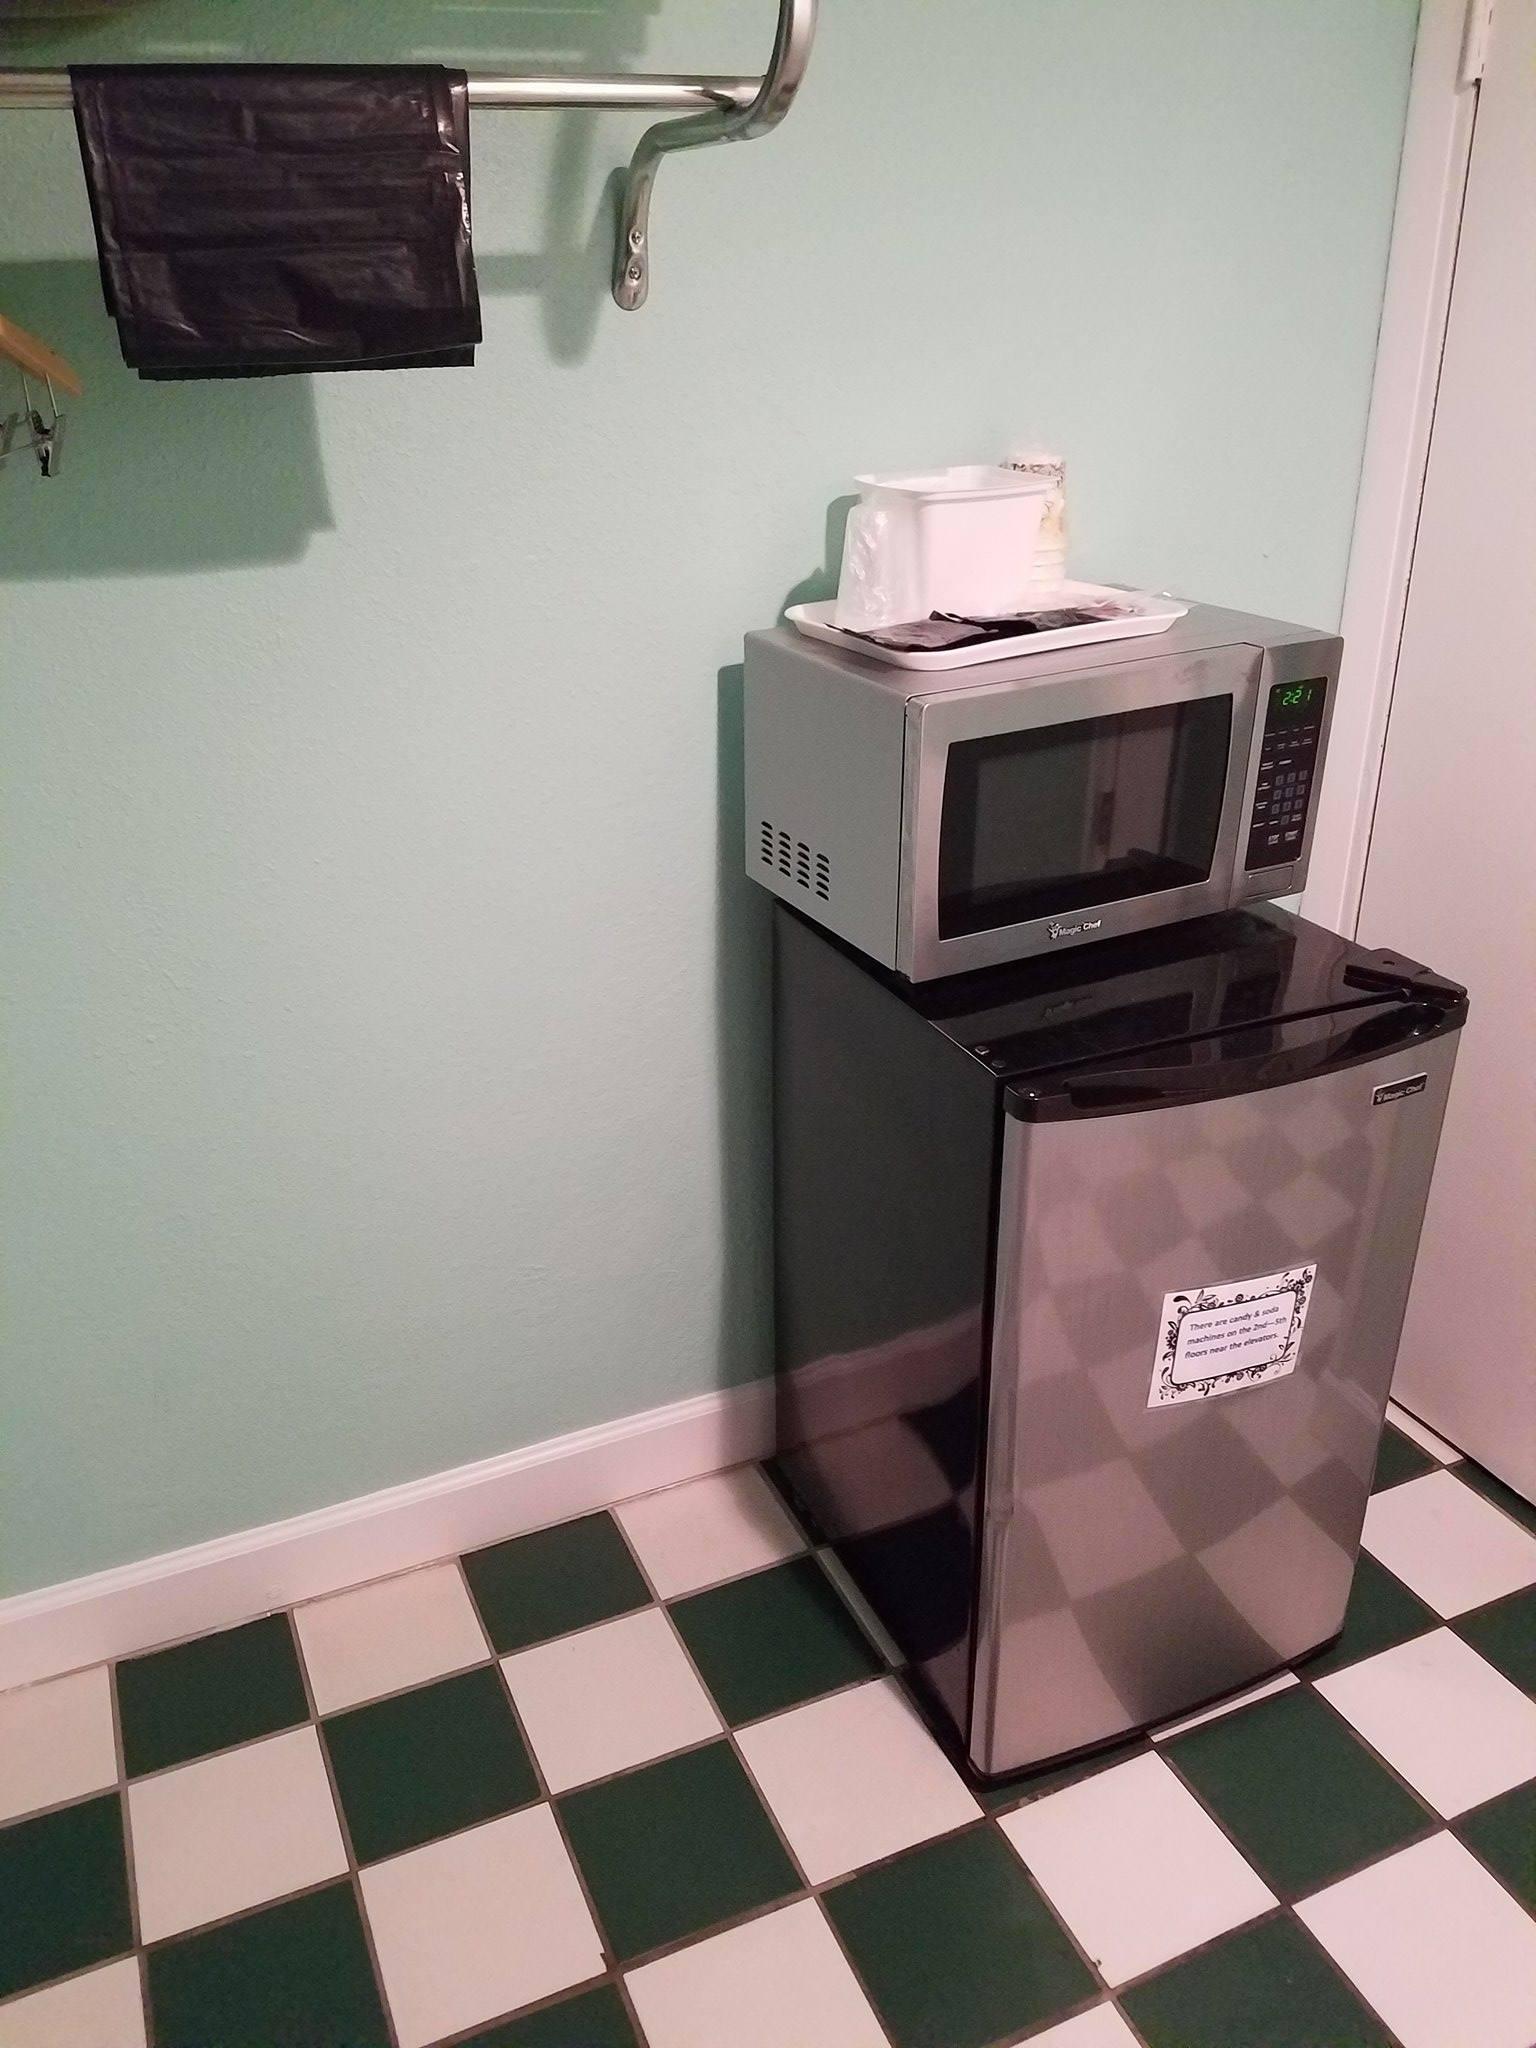 fridge/freezer & microwave